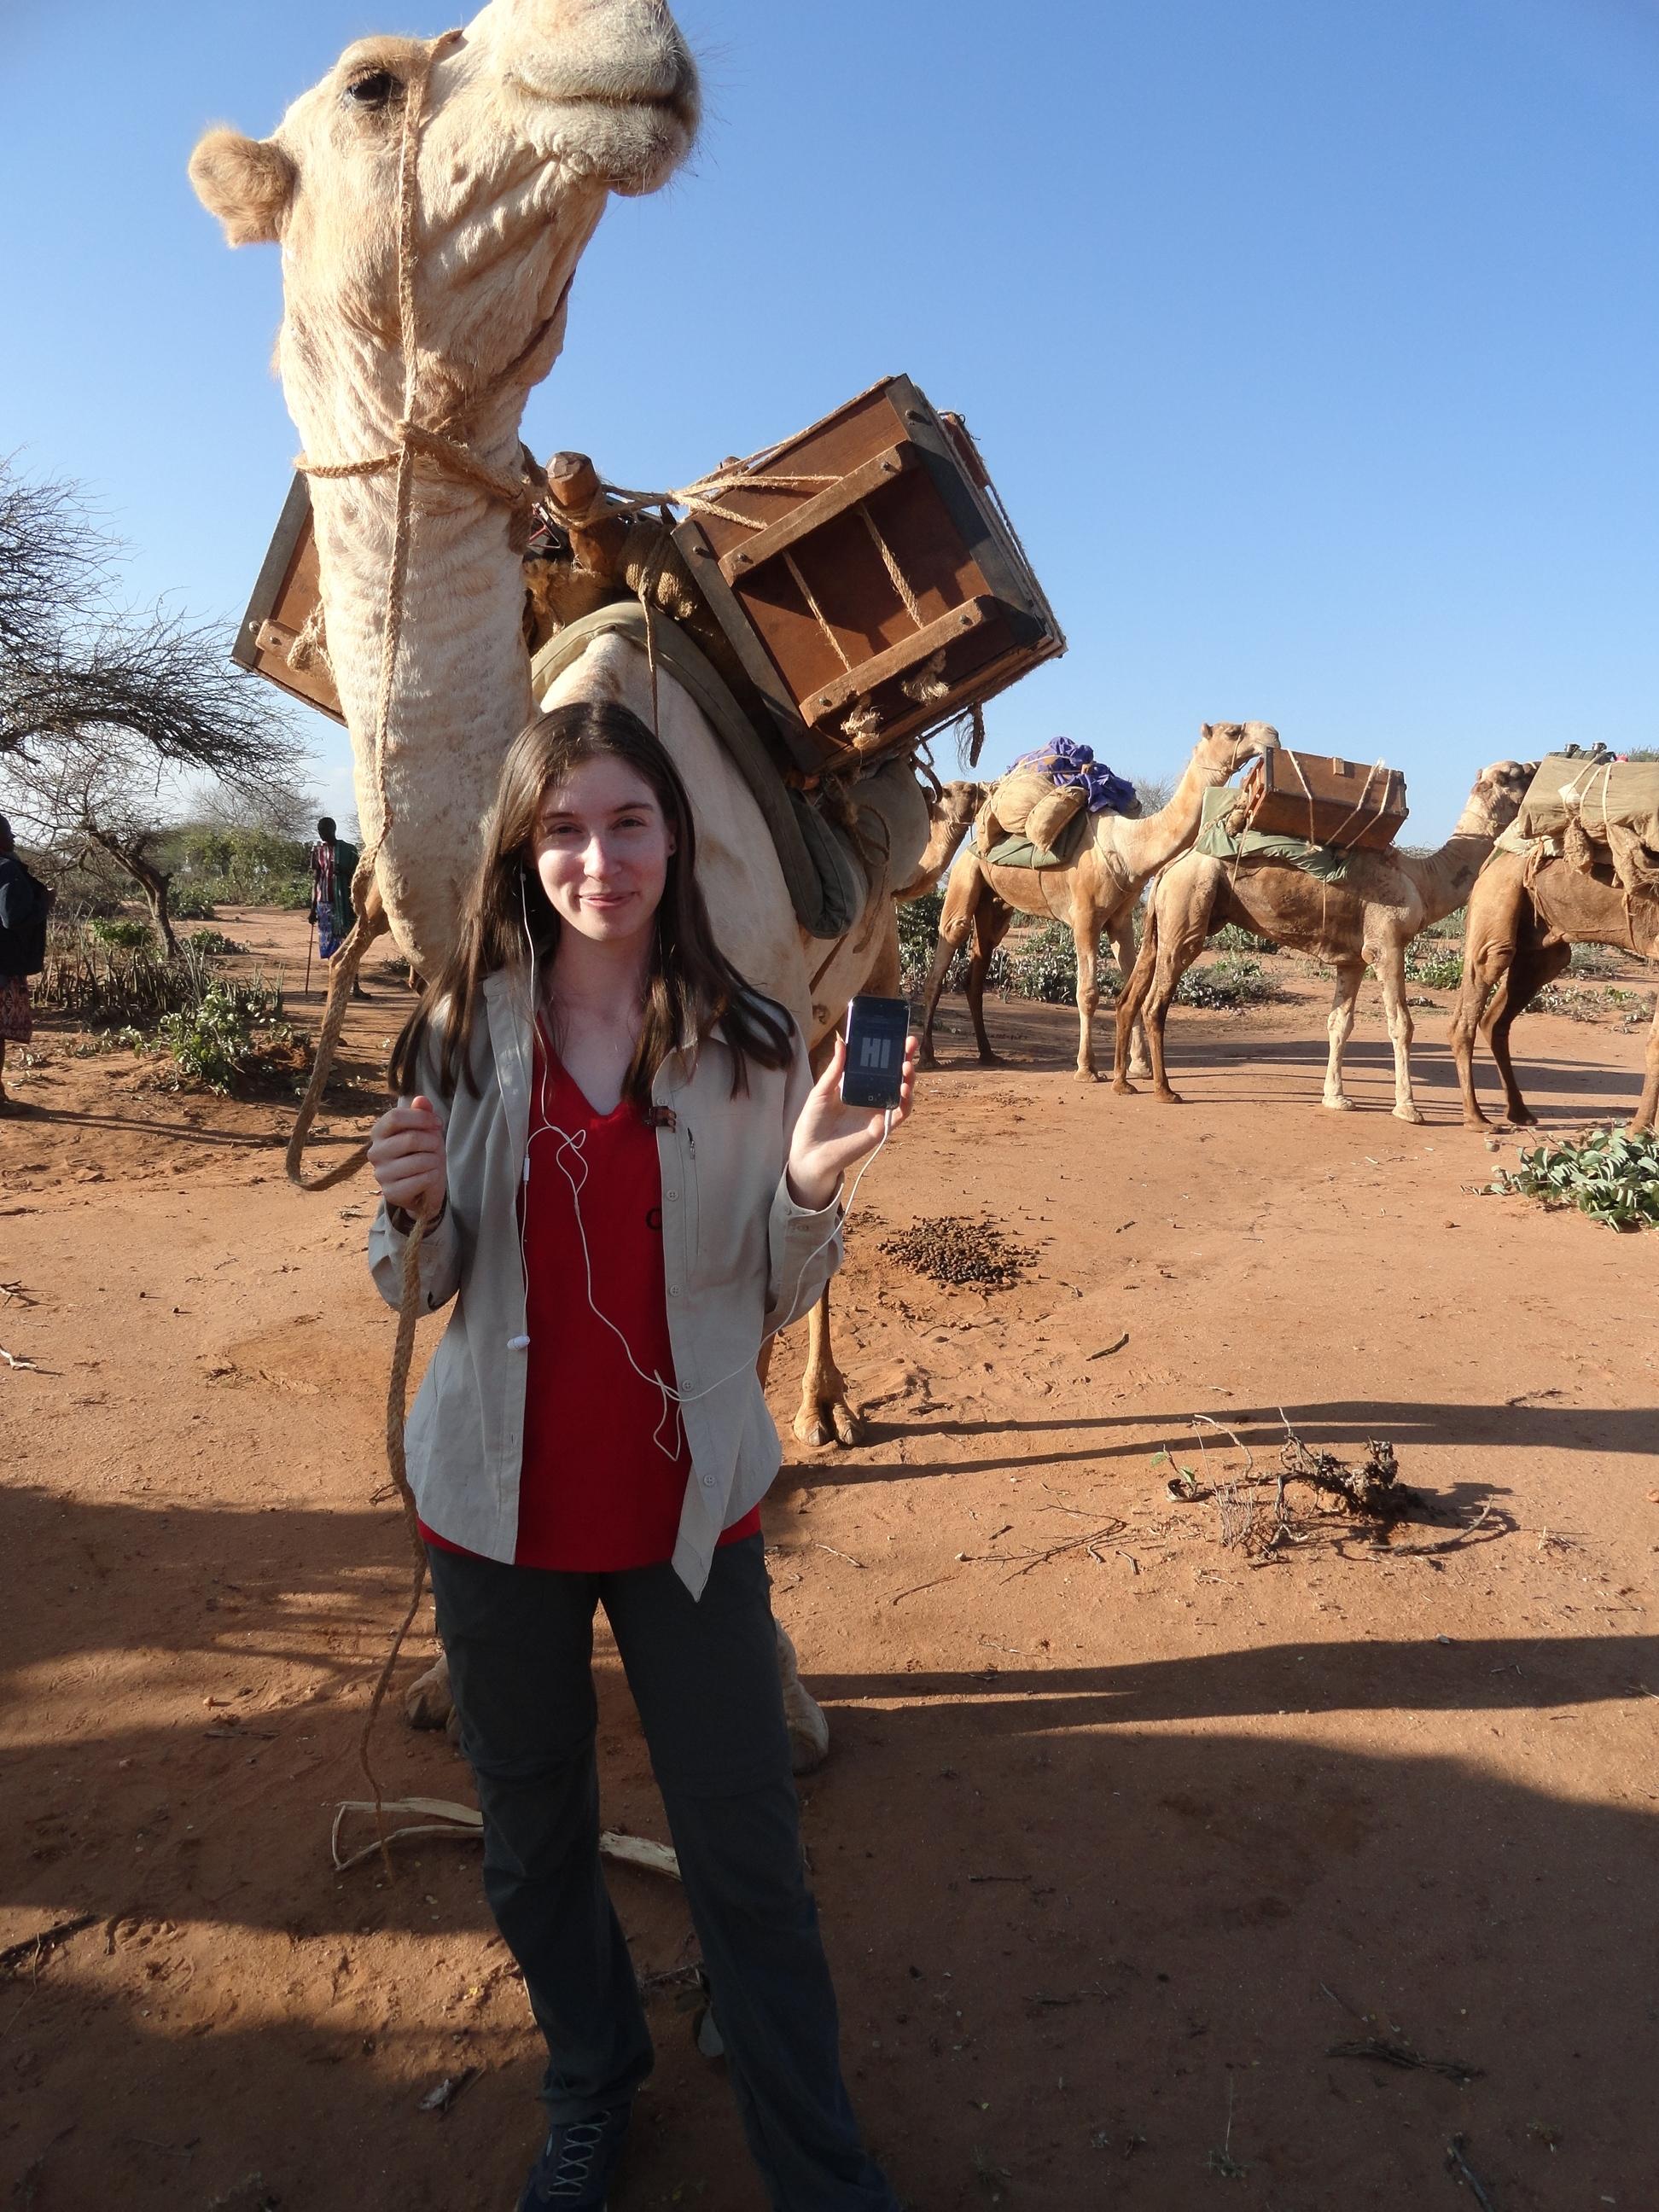 Dayna listened on a trek through the Kenyan desert